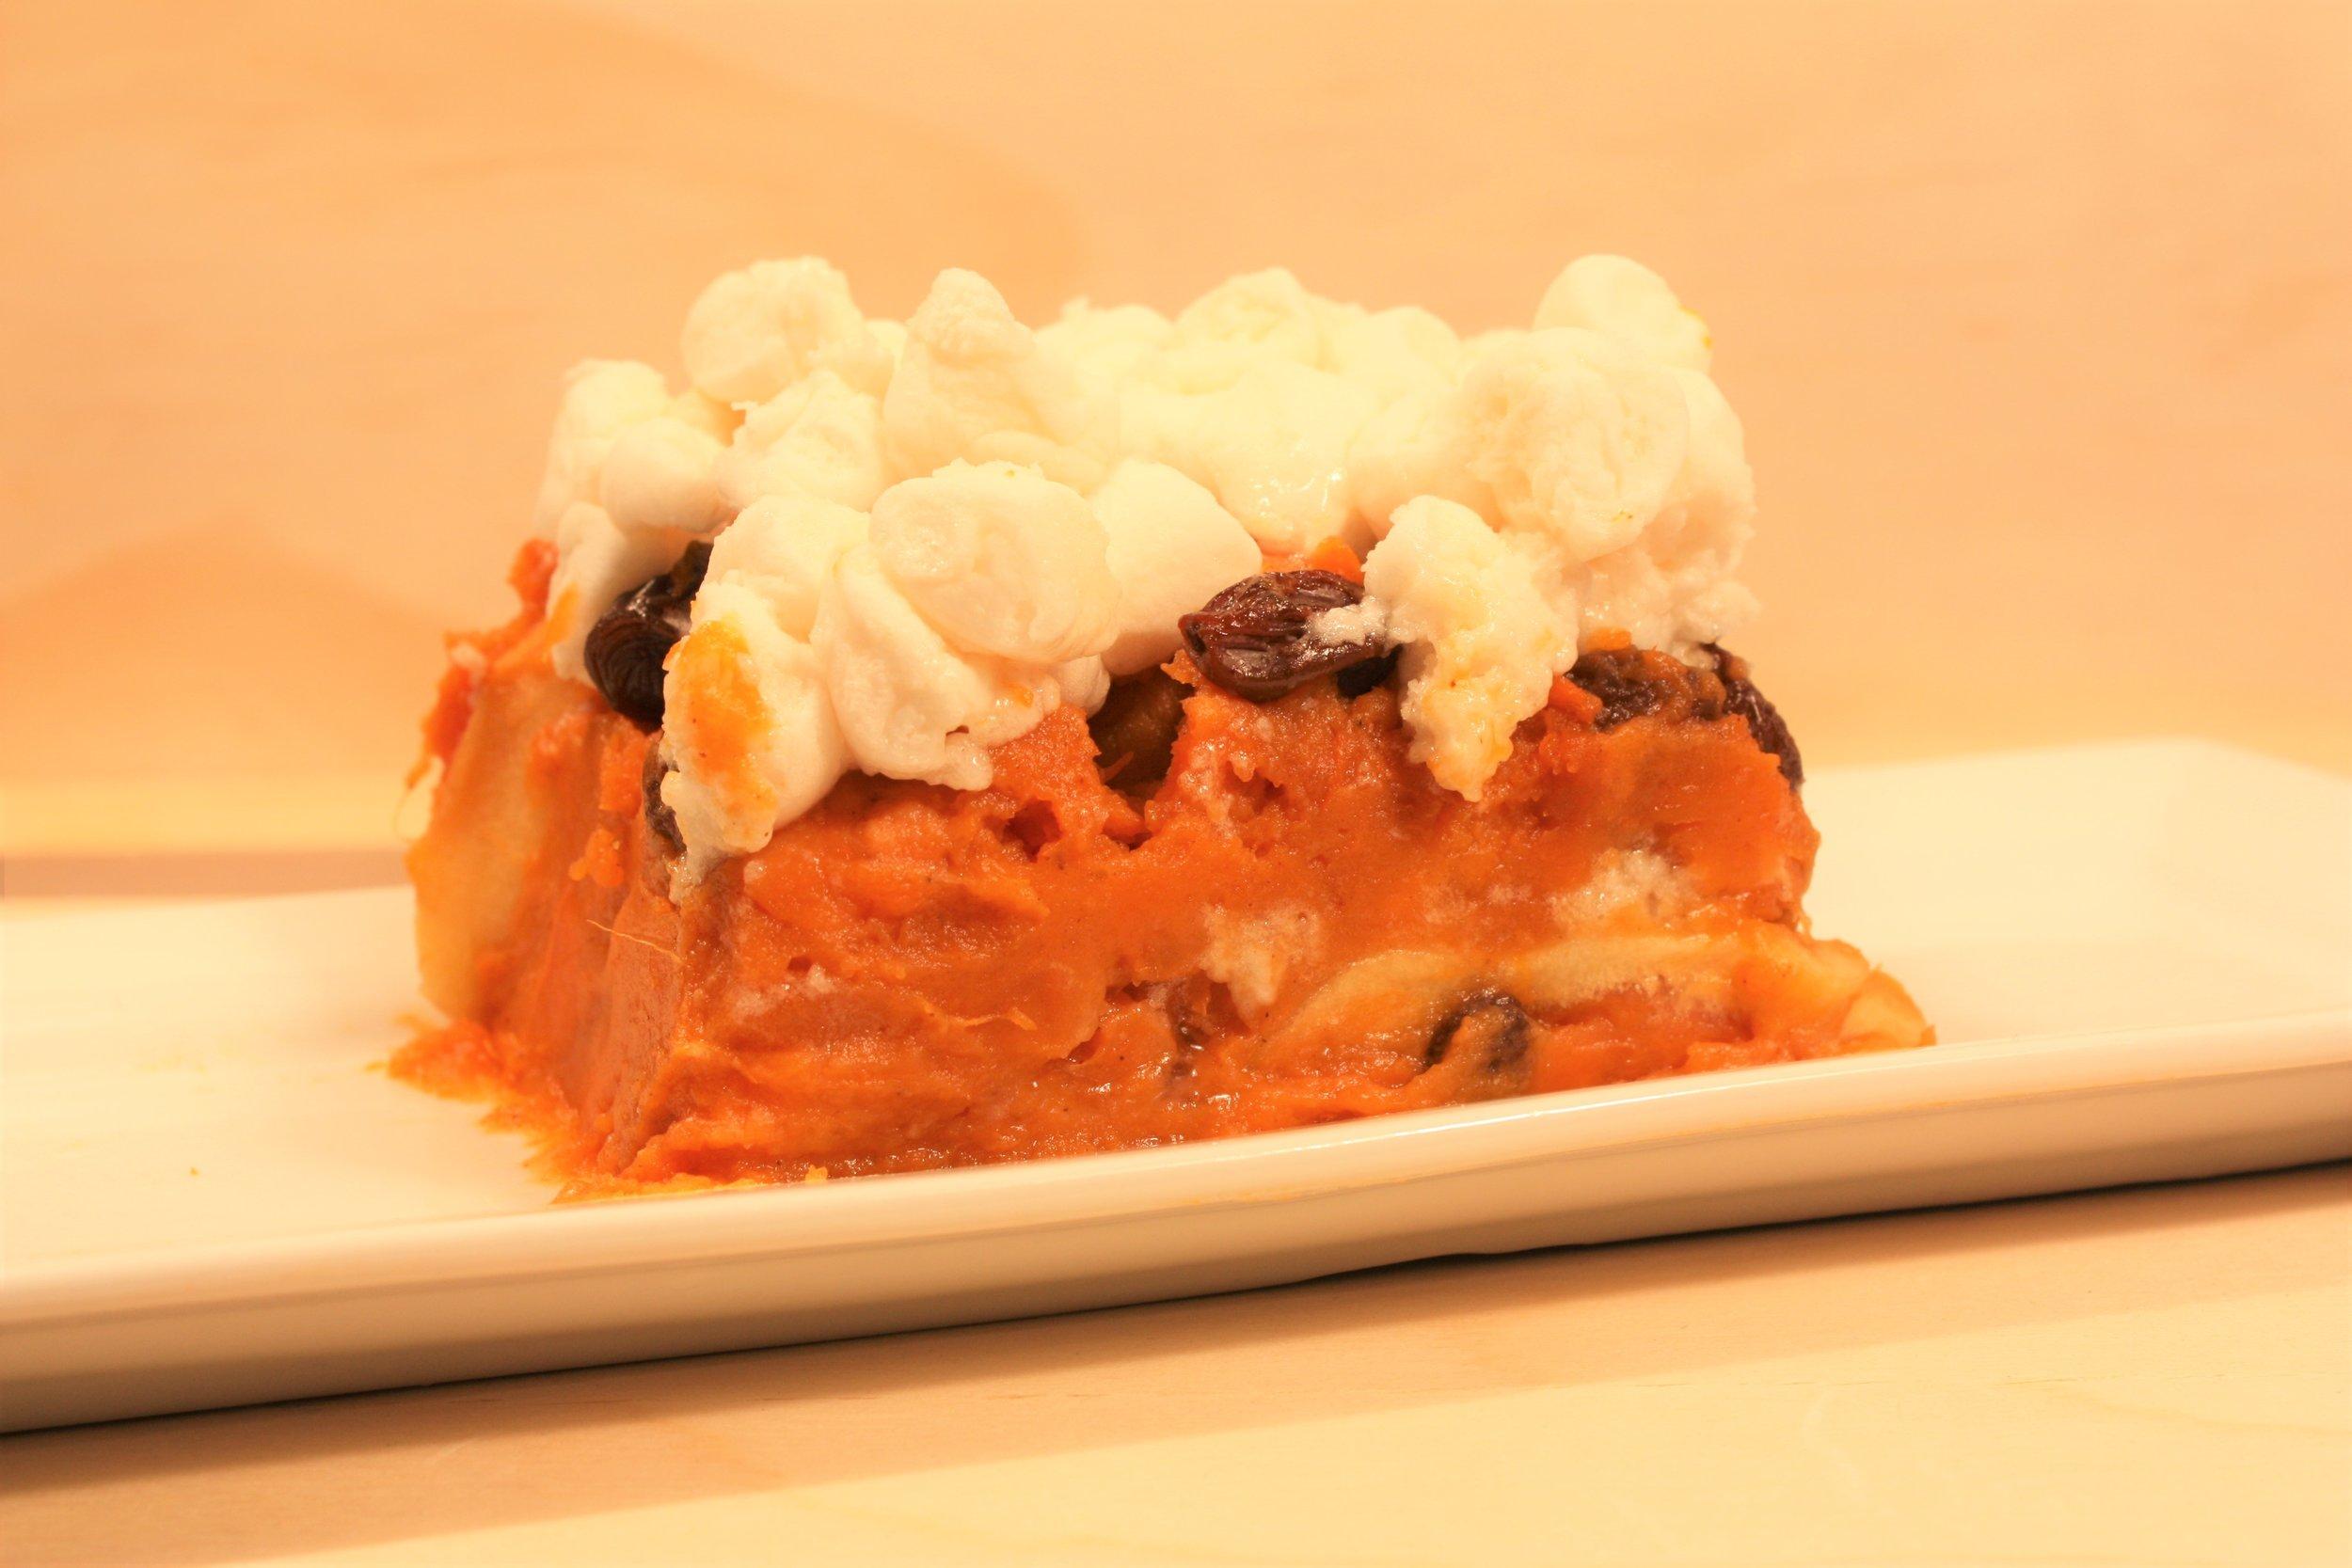 VEGANATION Sweet Potatoes